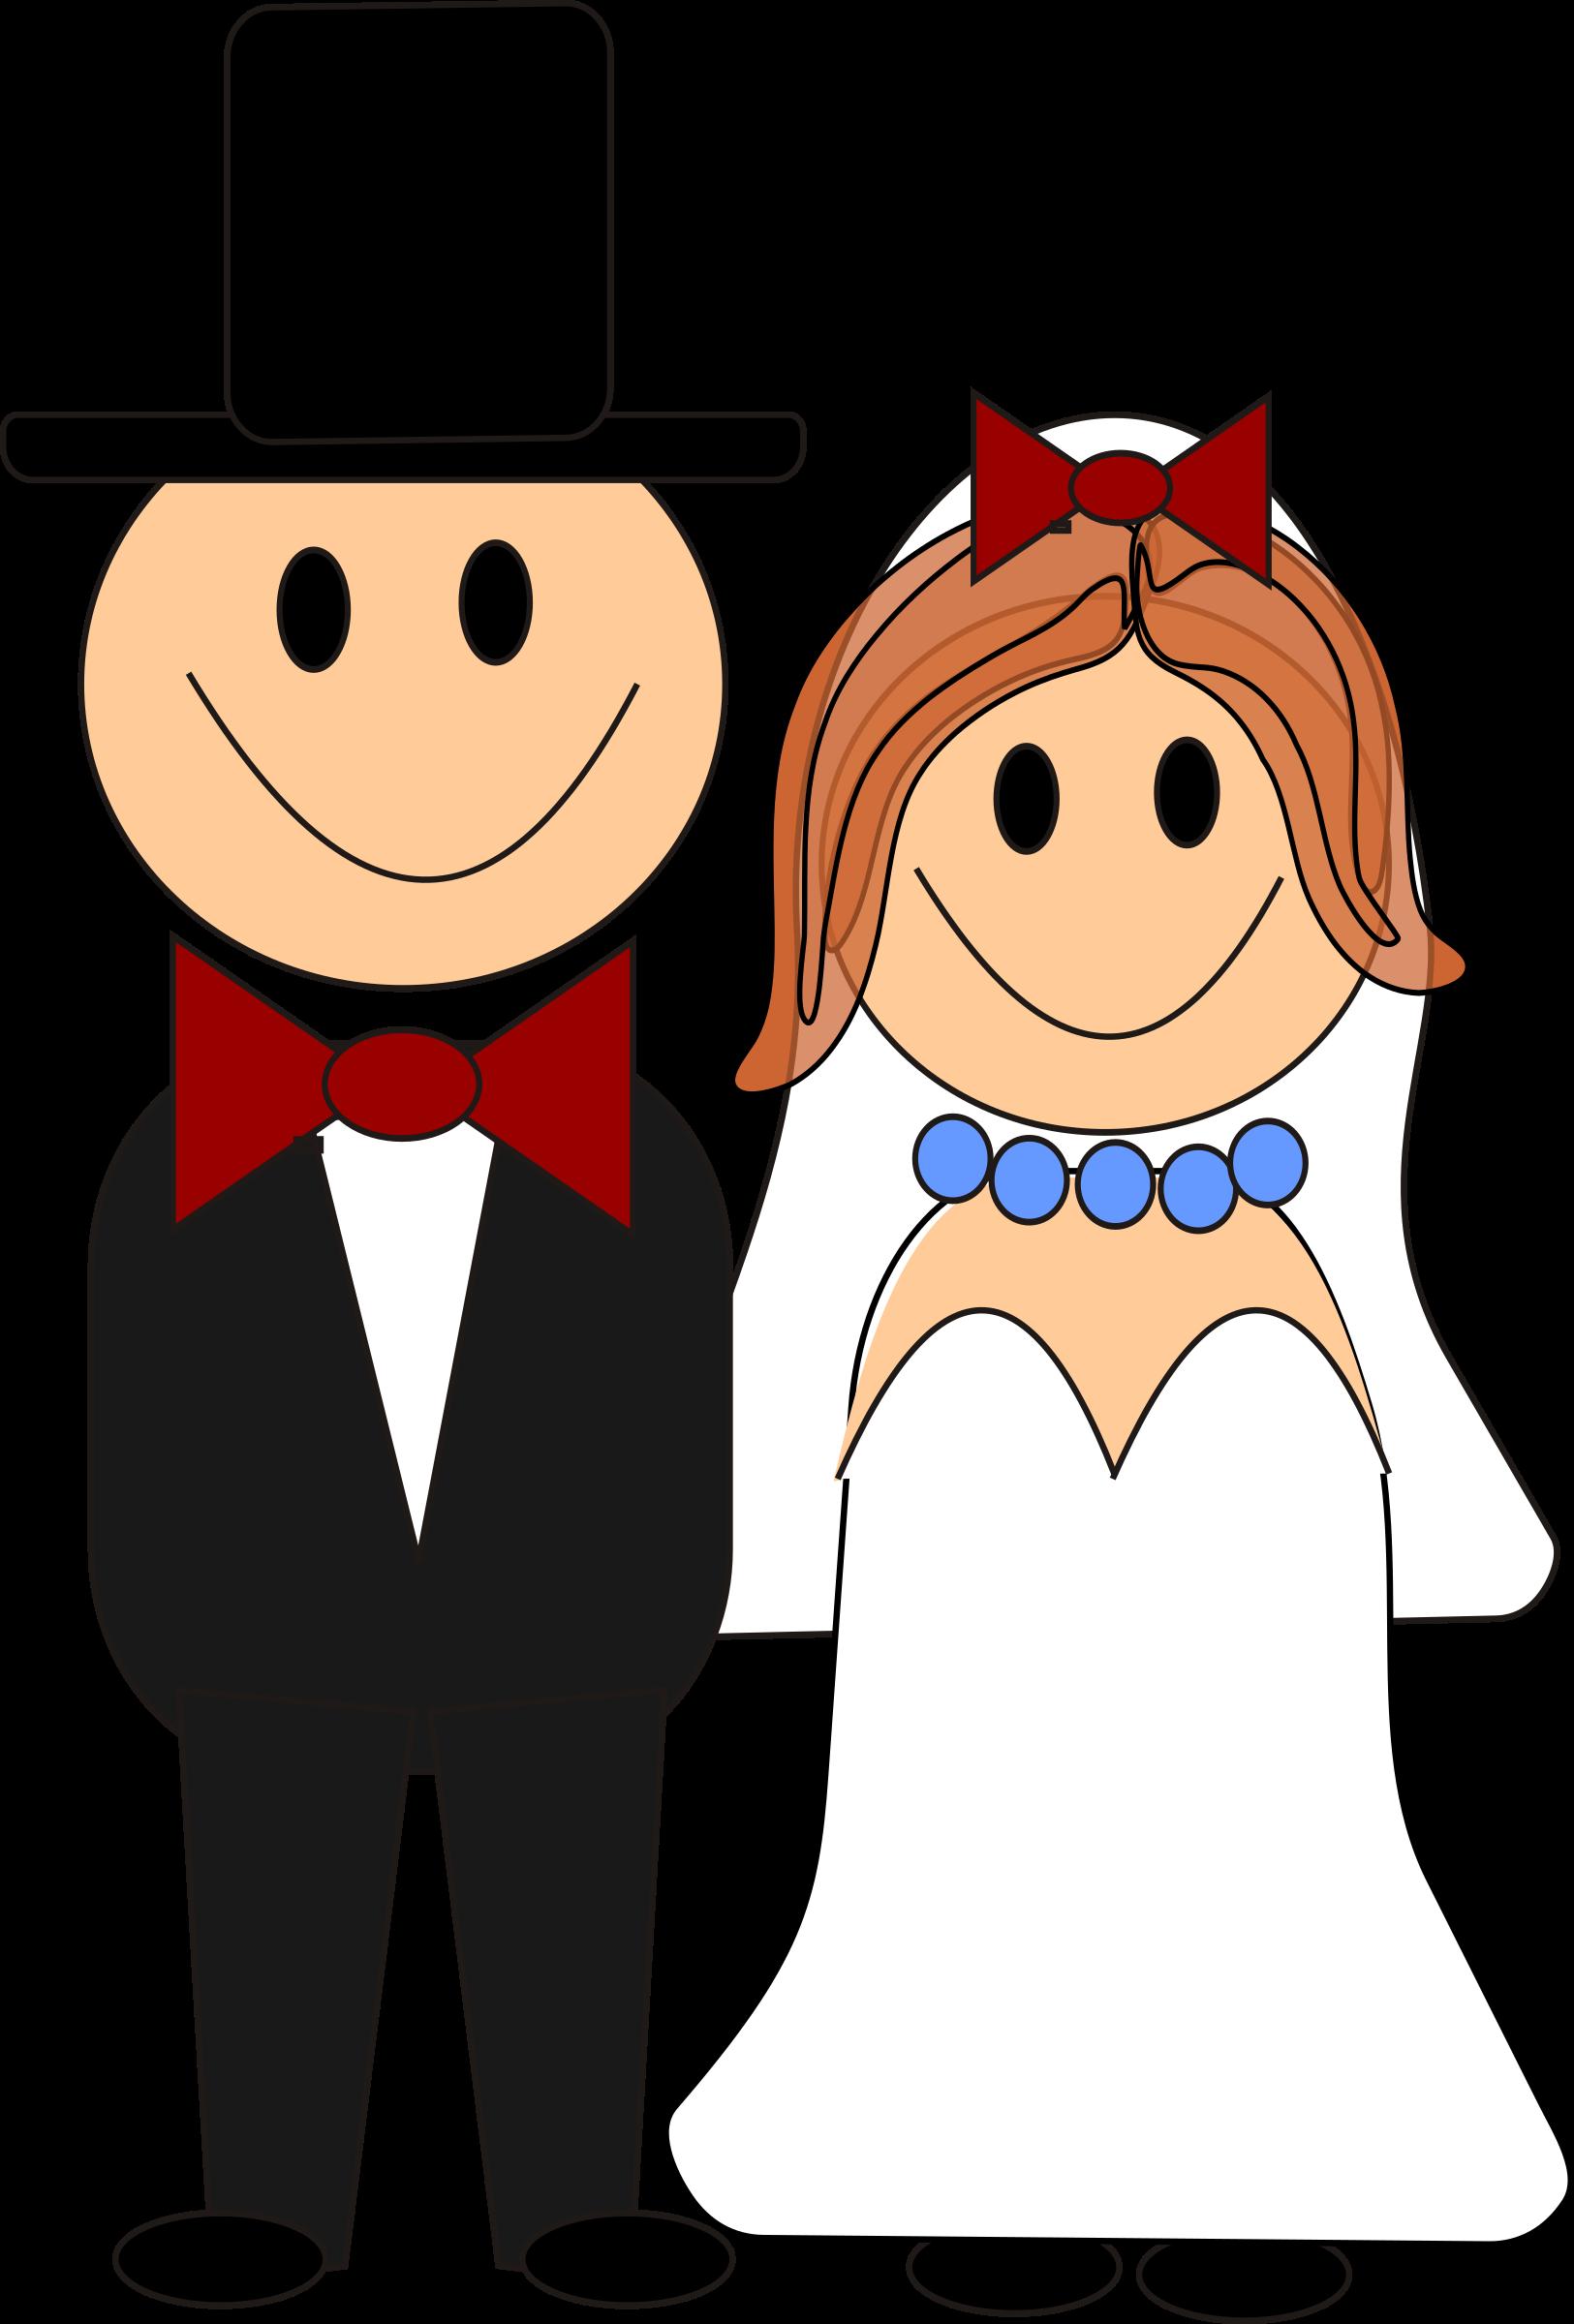 Brautpaar clip art gratis.